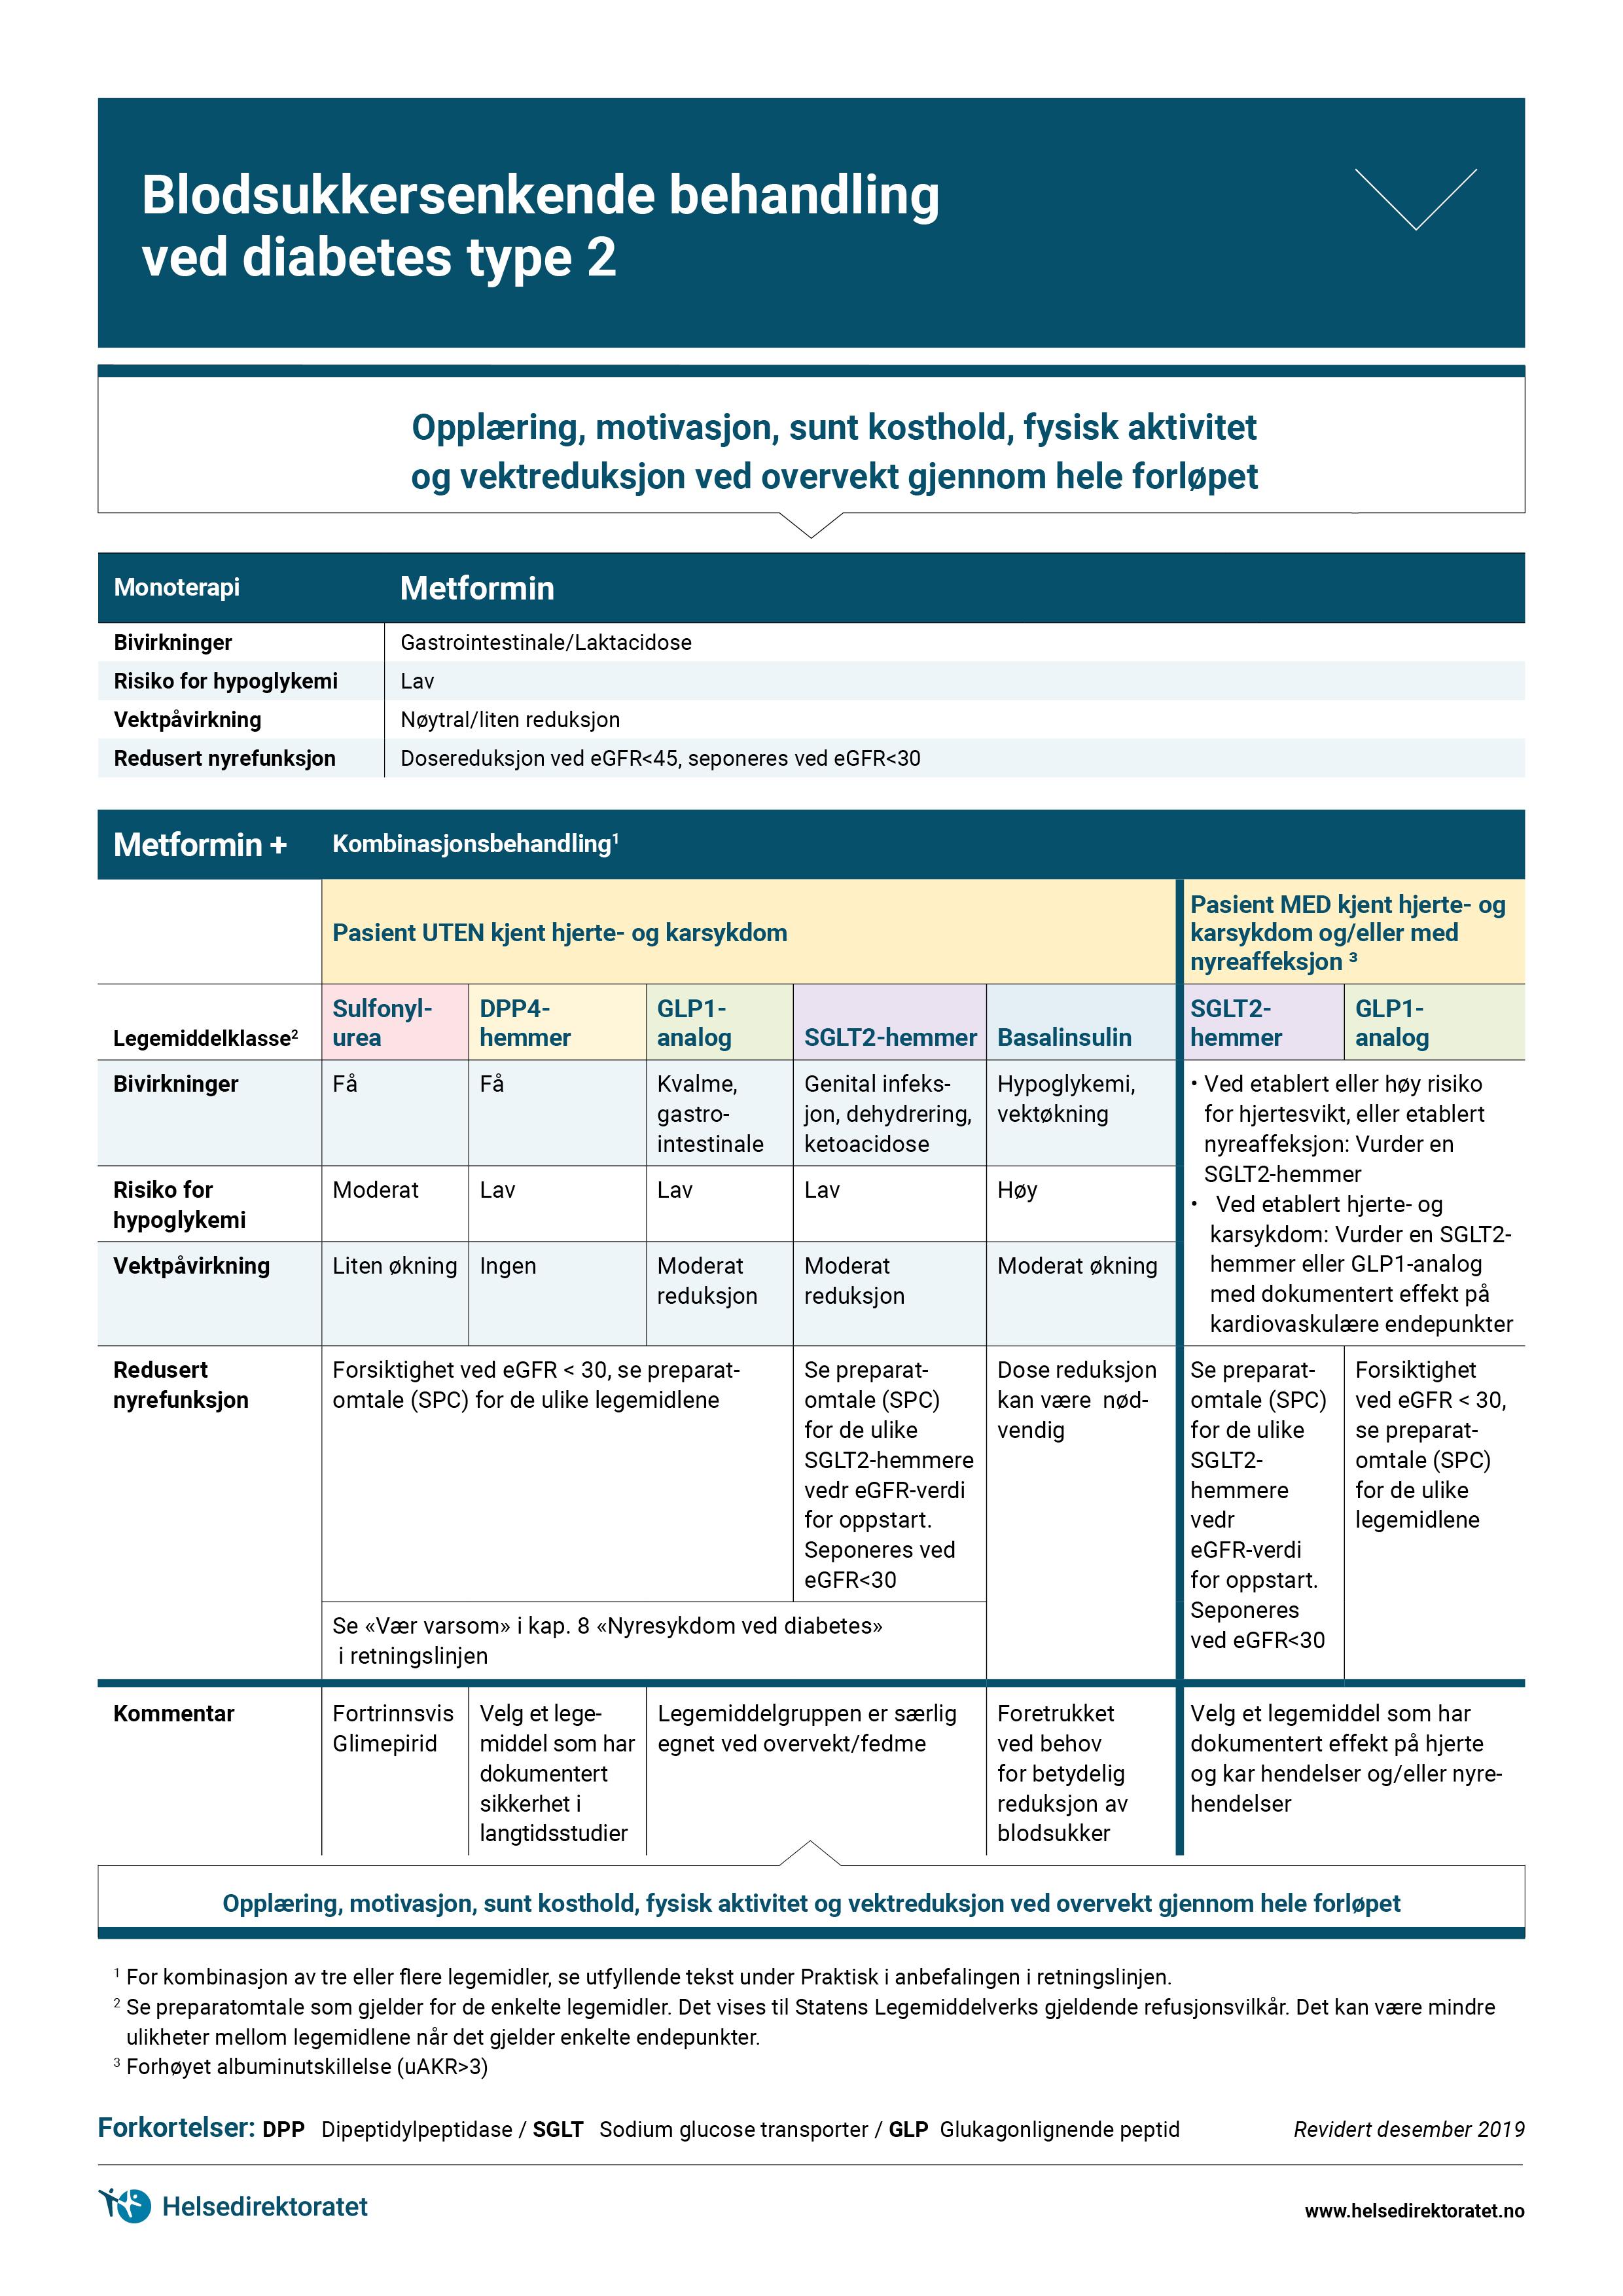 flytdiagram-blodsukkersenkende-behandling-ved-diabetes-type-2.jpg